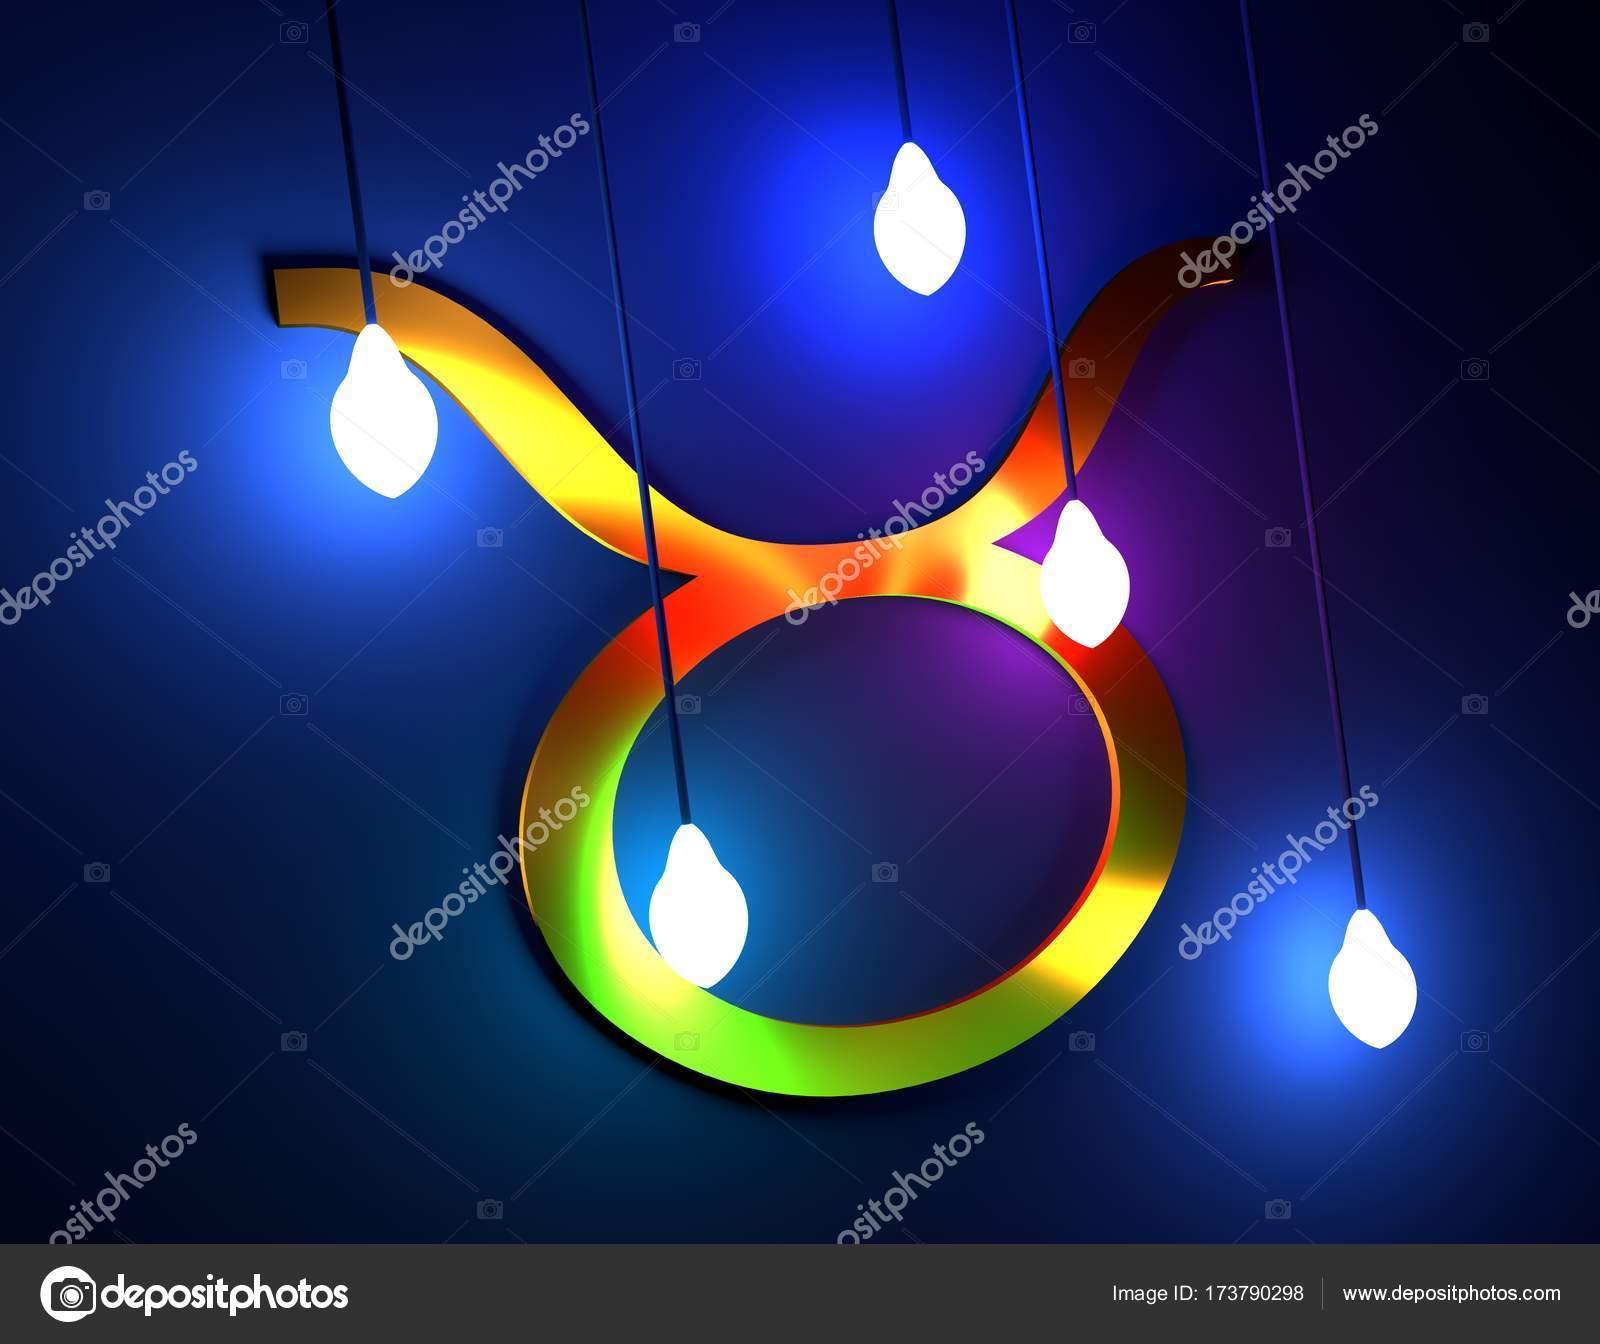 Taurus Astrology Symbol Stock Photo Jegasra 173790298